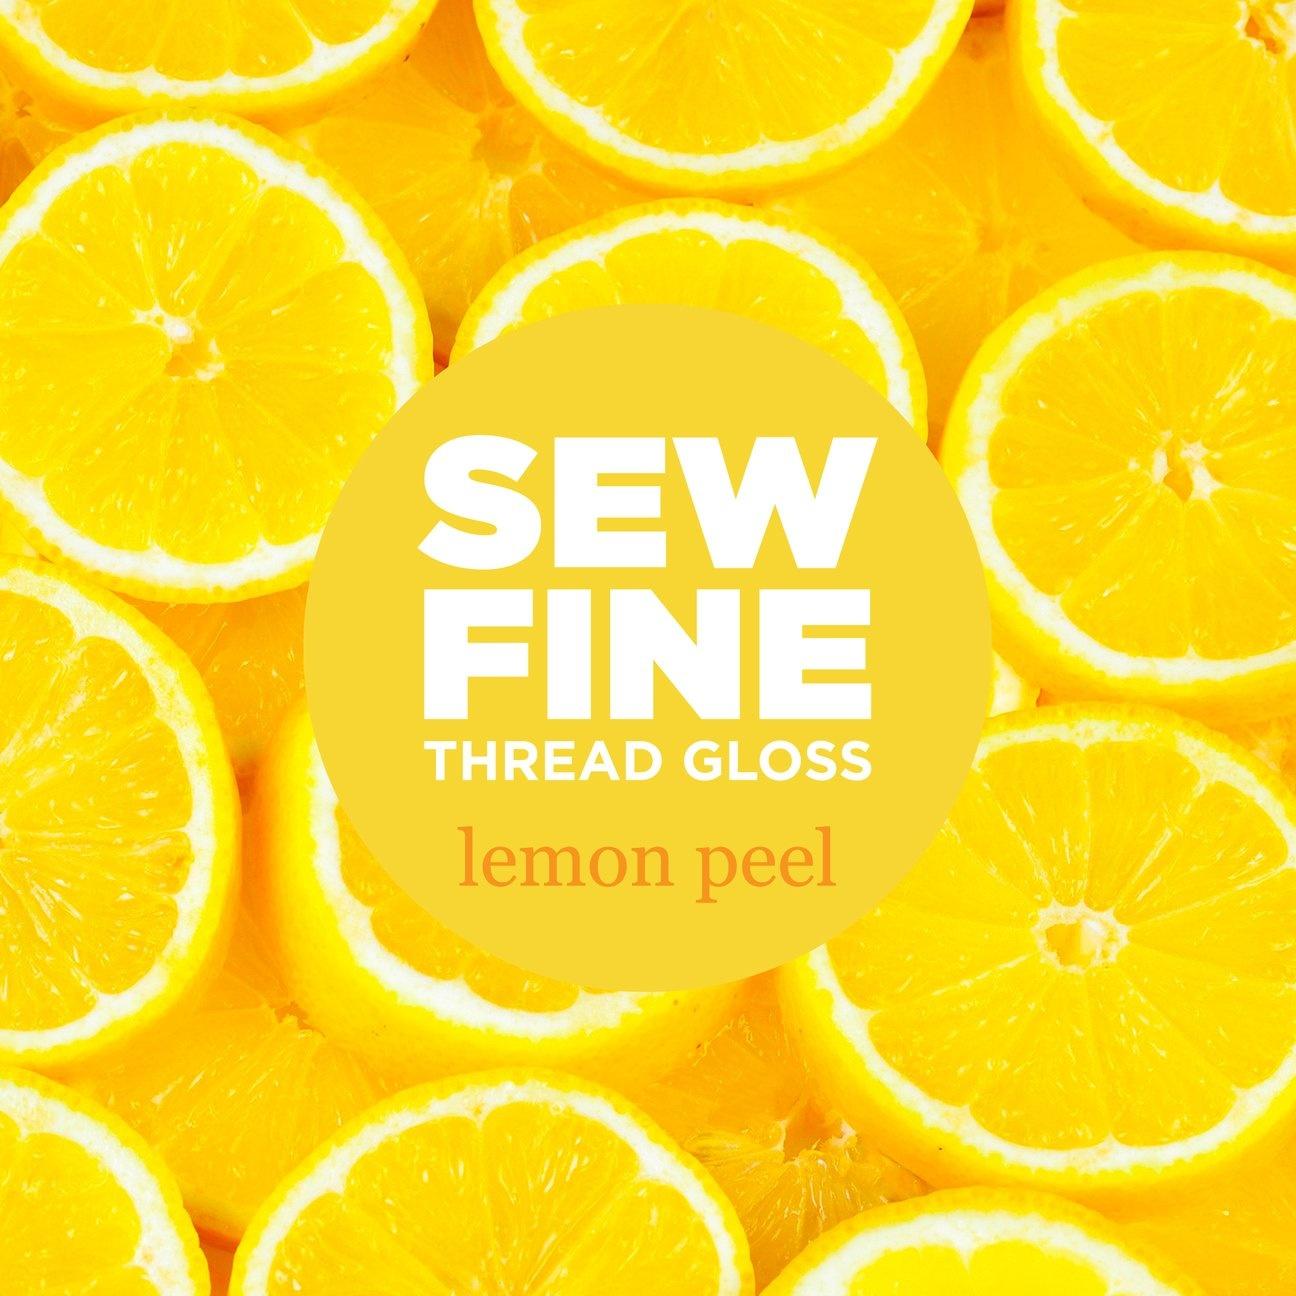 Sew Fine Thread Gloss : Lemon